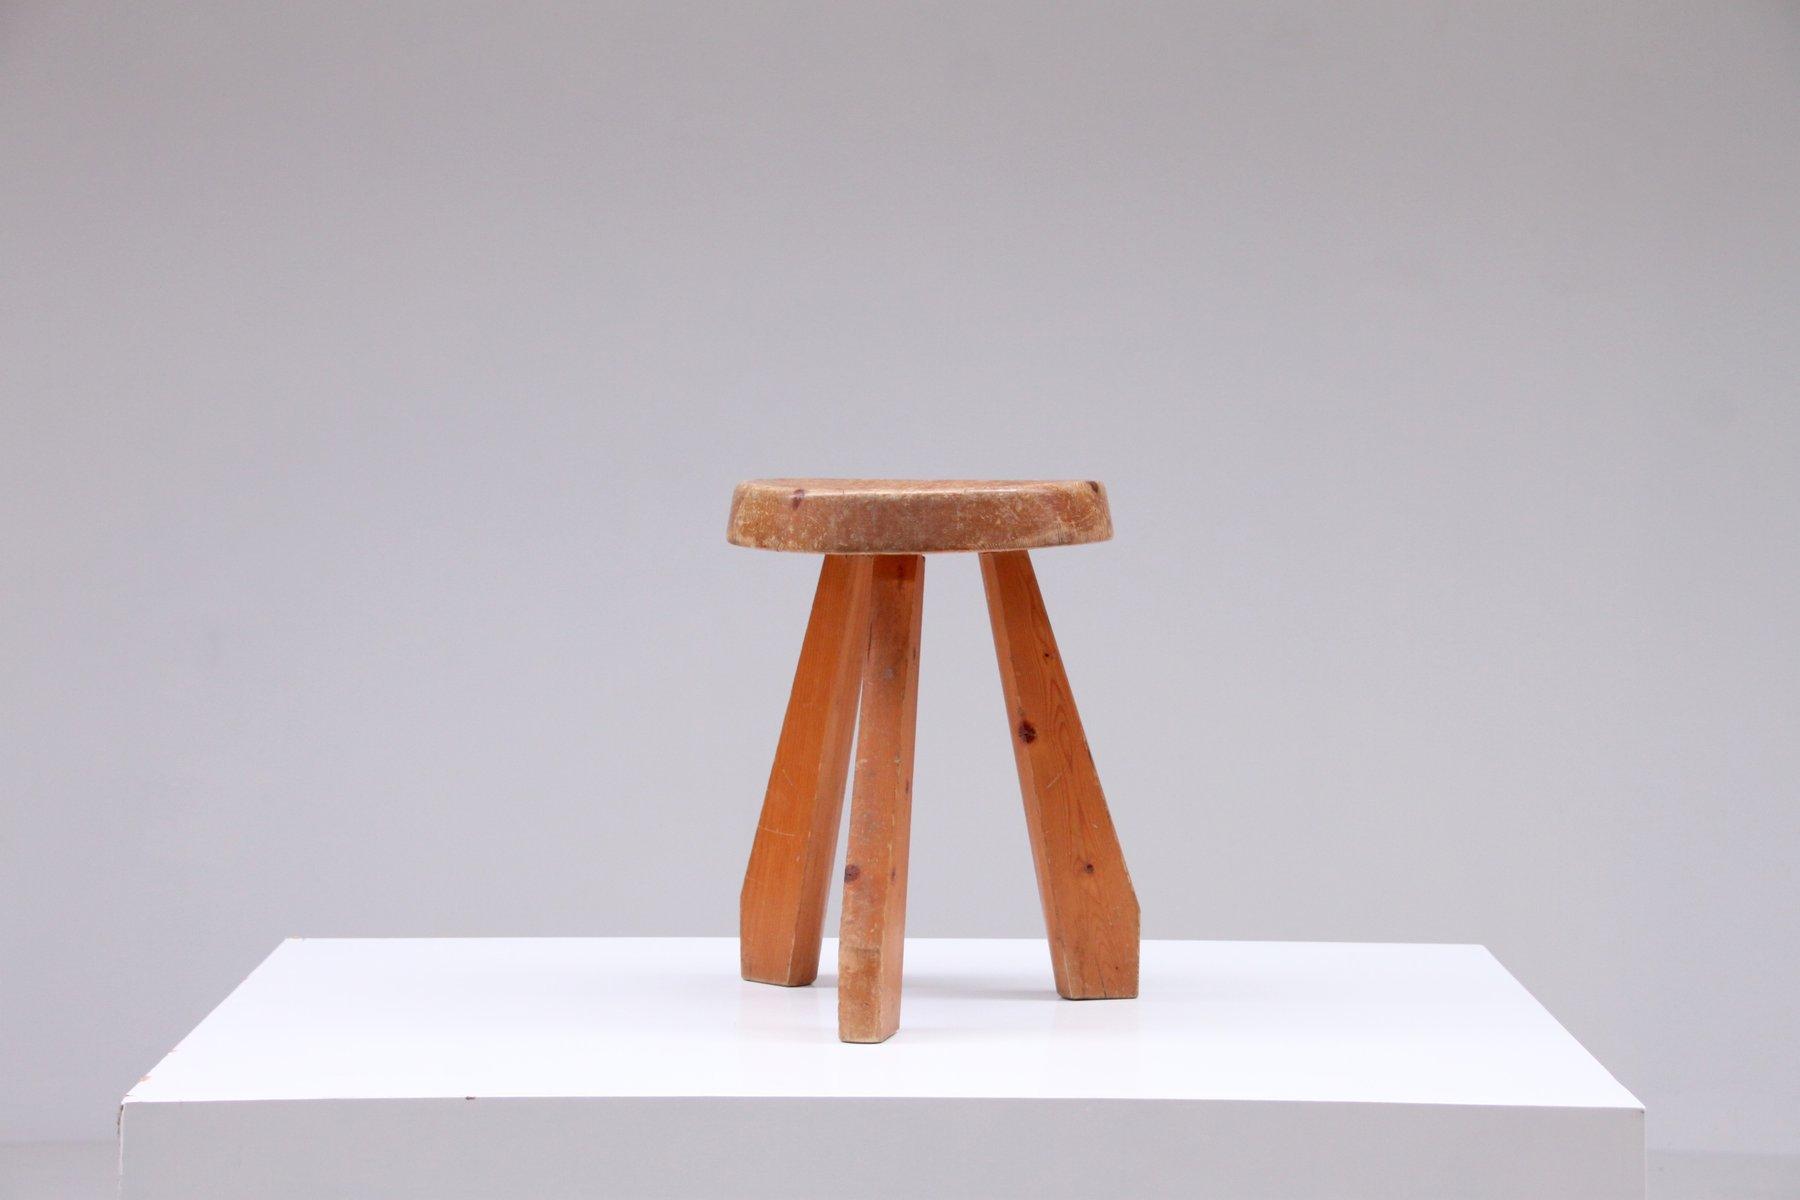 tabouret sandoz par charlotte perriand en vente sur pamono. Black Bedroom Furniture Sets. Home Design Ideas